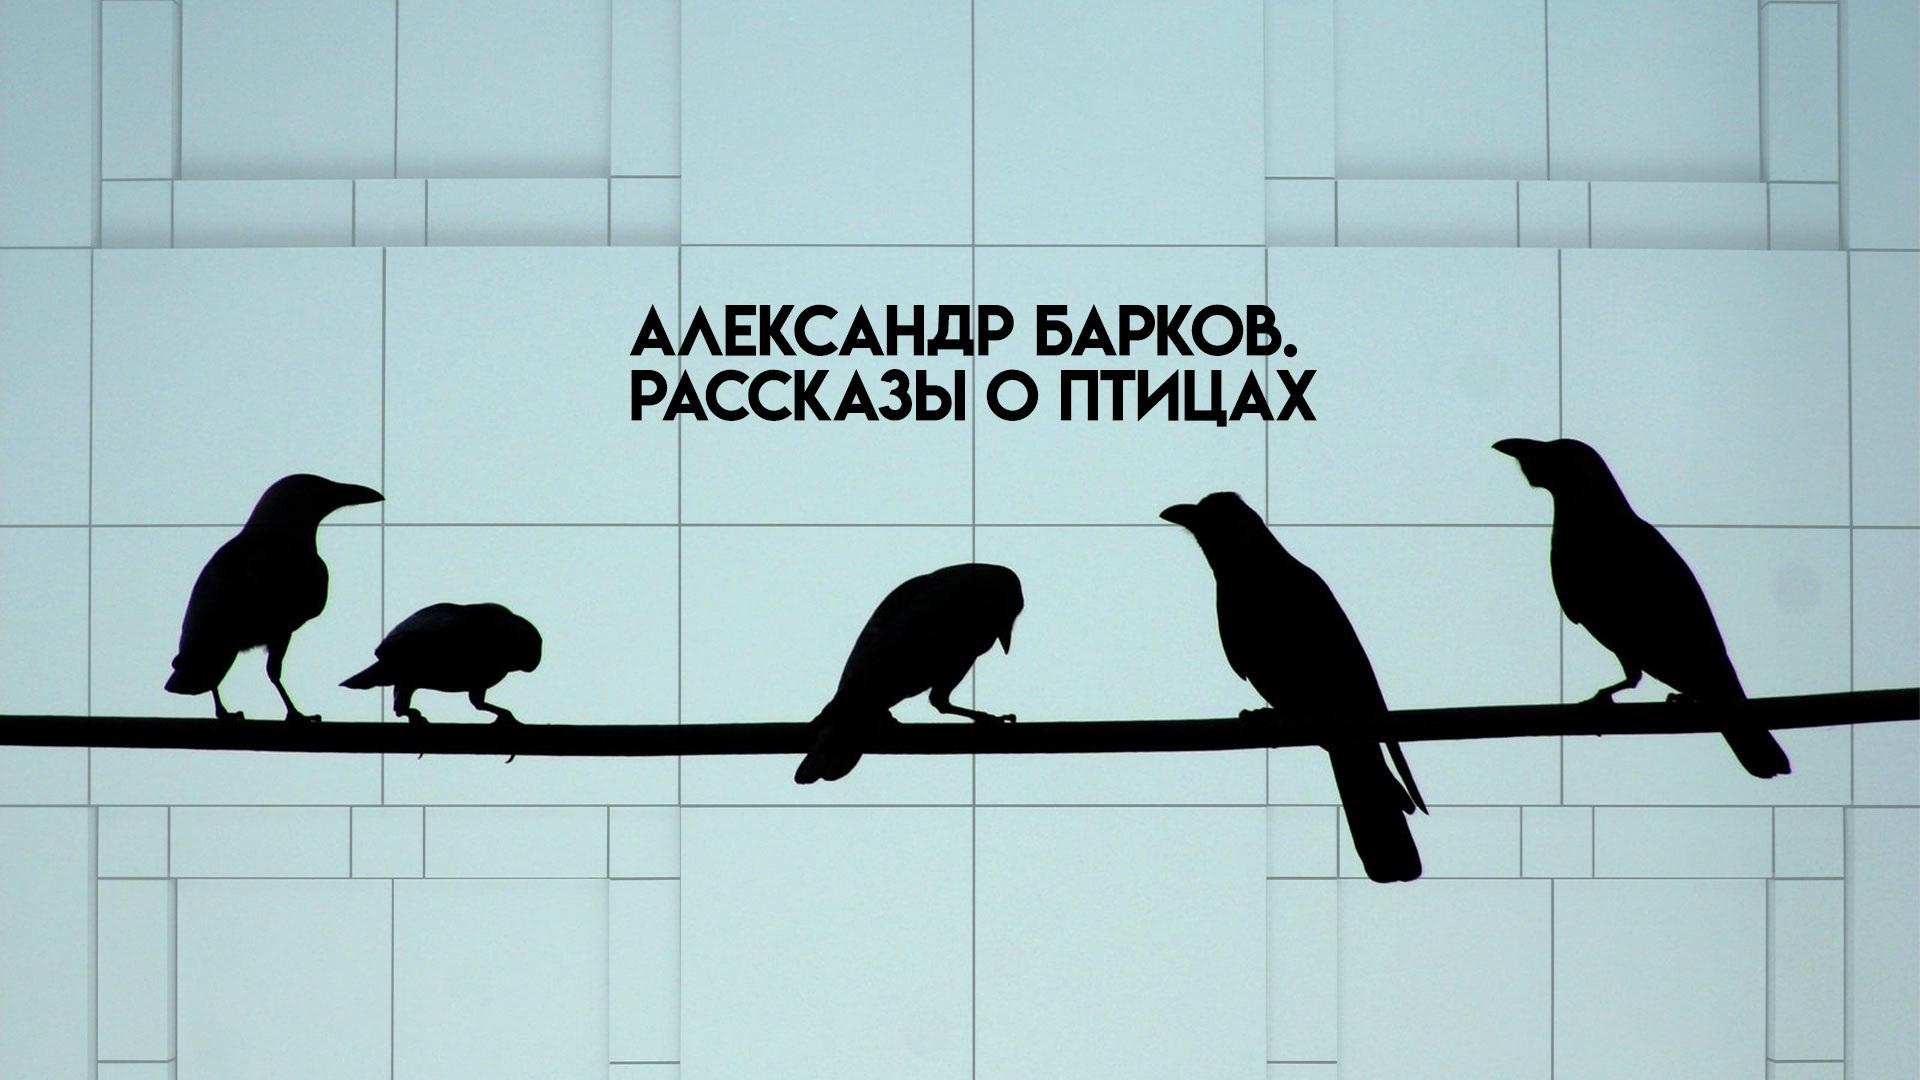 Александр Барков. Рассказы о птицах